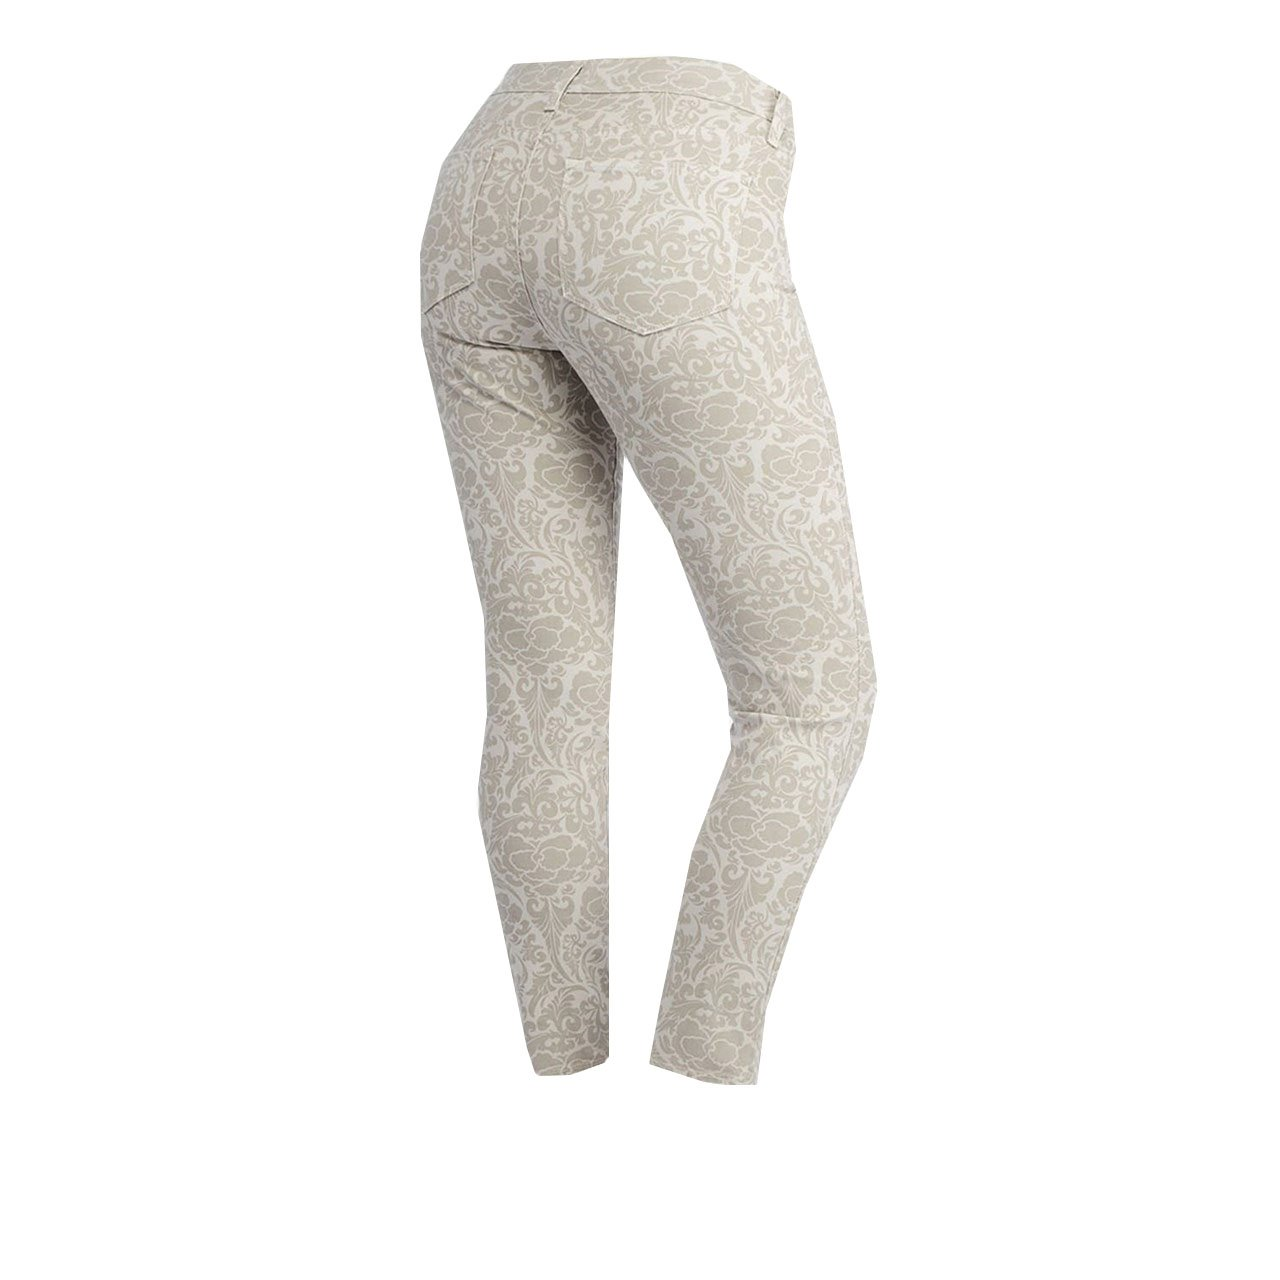 NYDJ Not Your Daughters Jeans Petite Alisha Bone Primrose Ankle Pants Size 6P